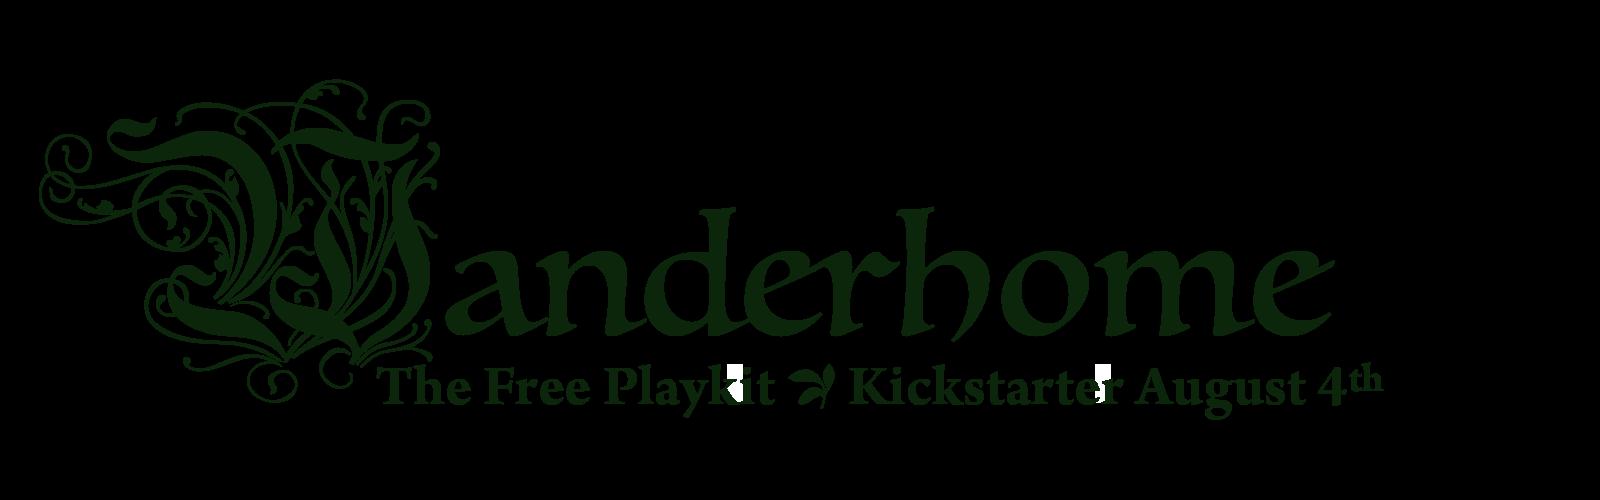 Wanderhome (Free Playkit) - Kickstarter 8/4/20